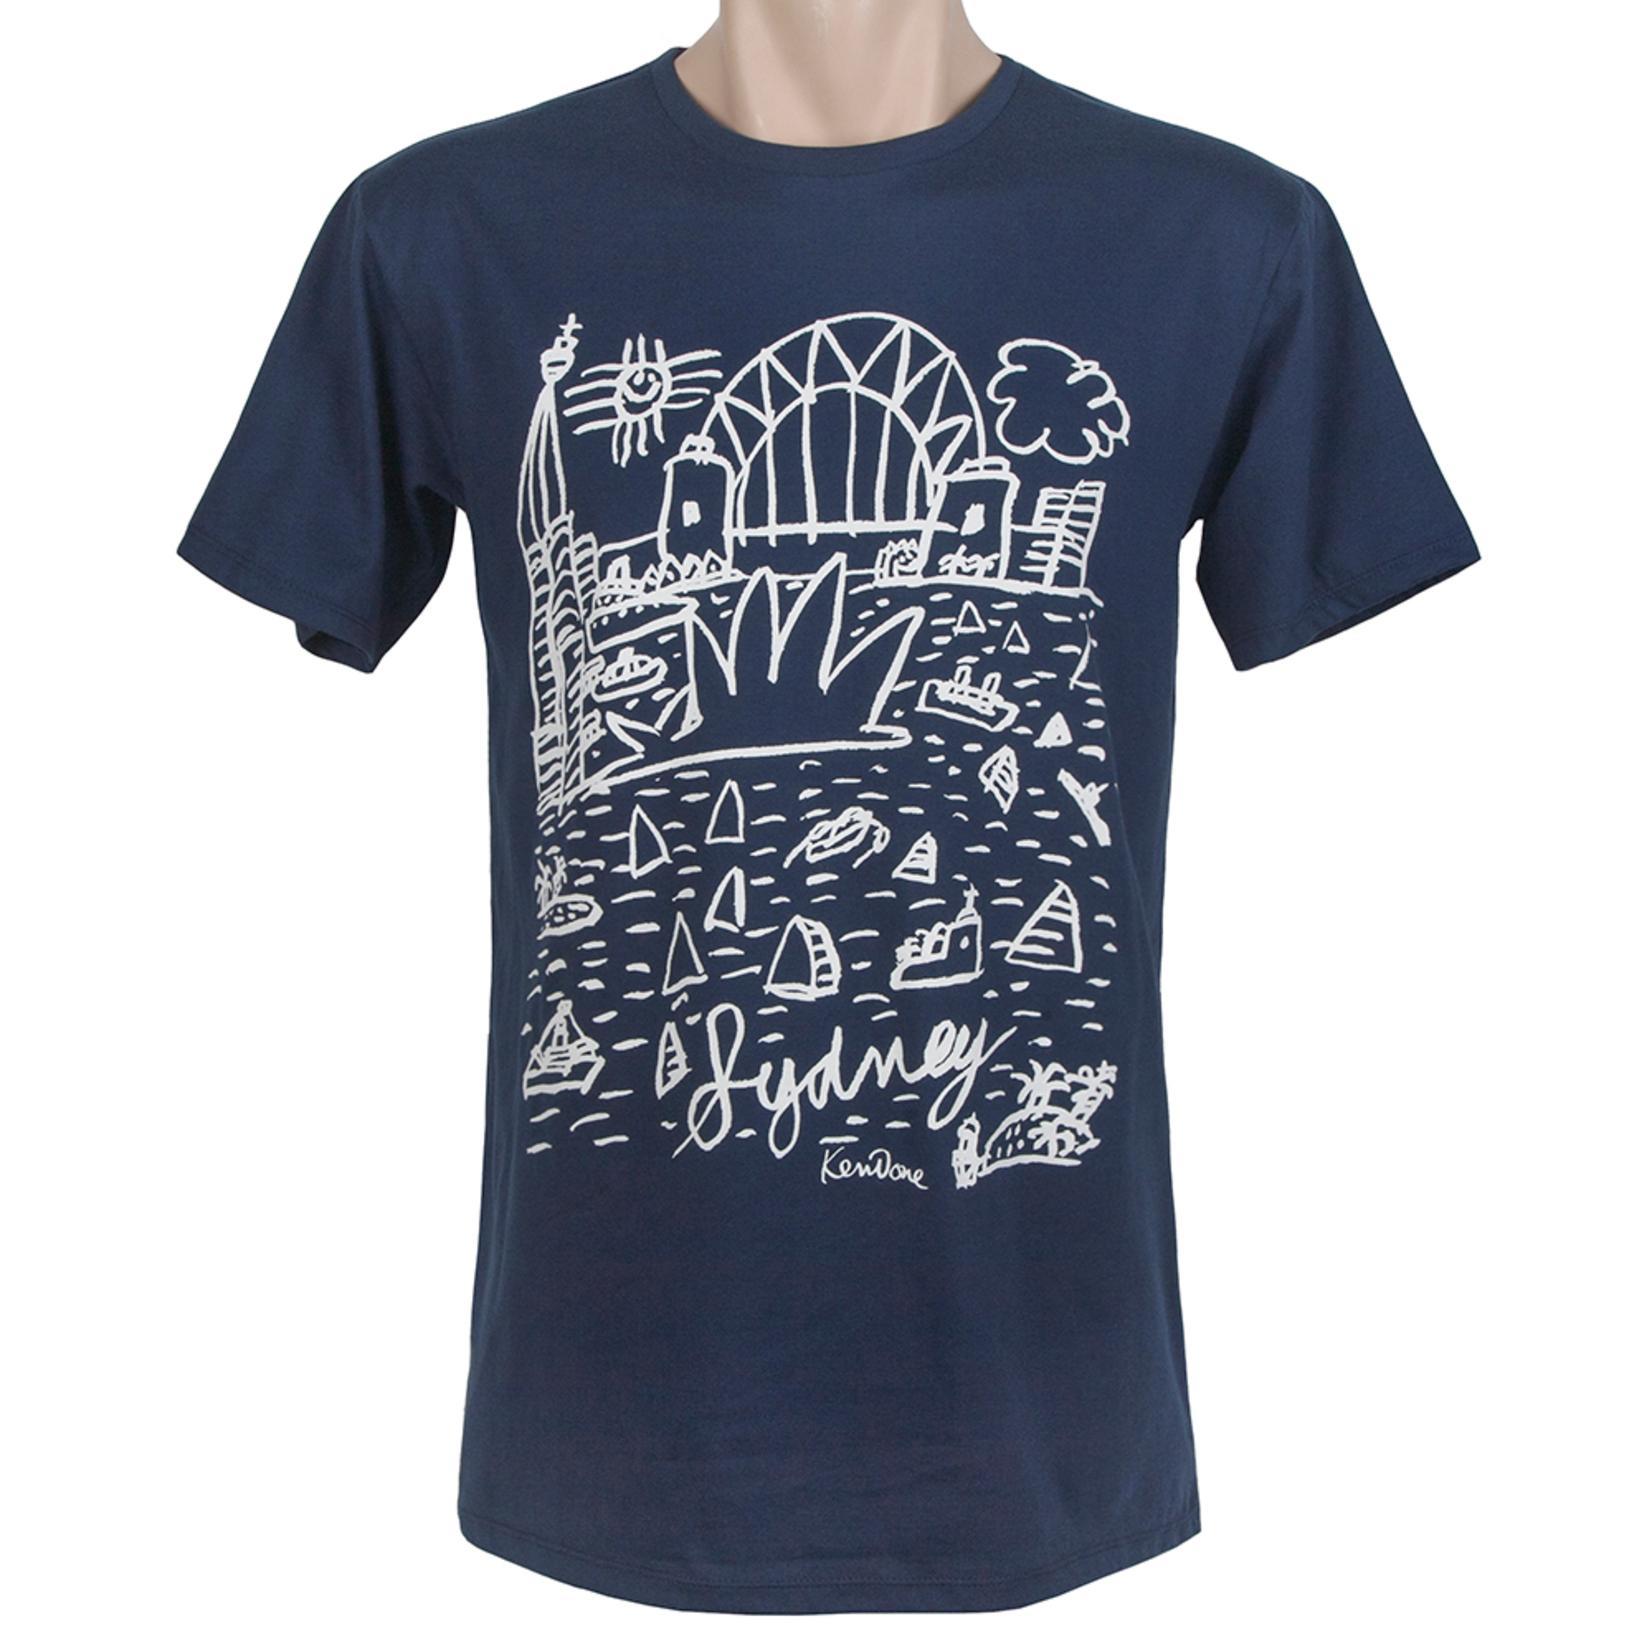 Clothing Tshirt - Classic - Sydney Vintage Navy